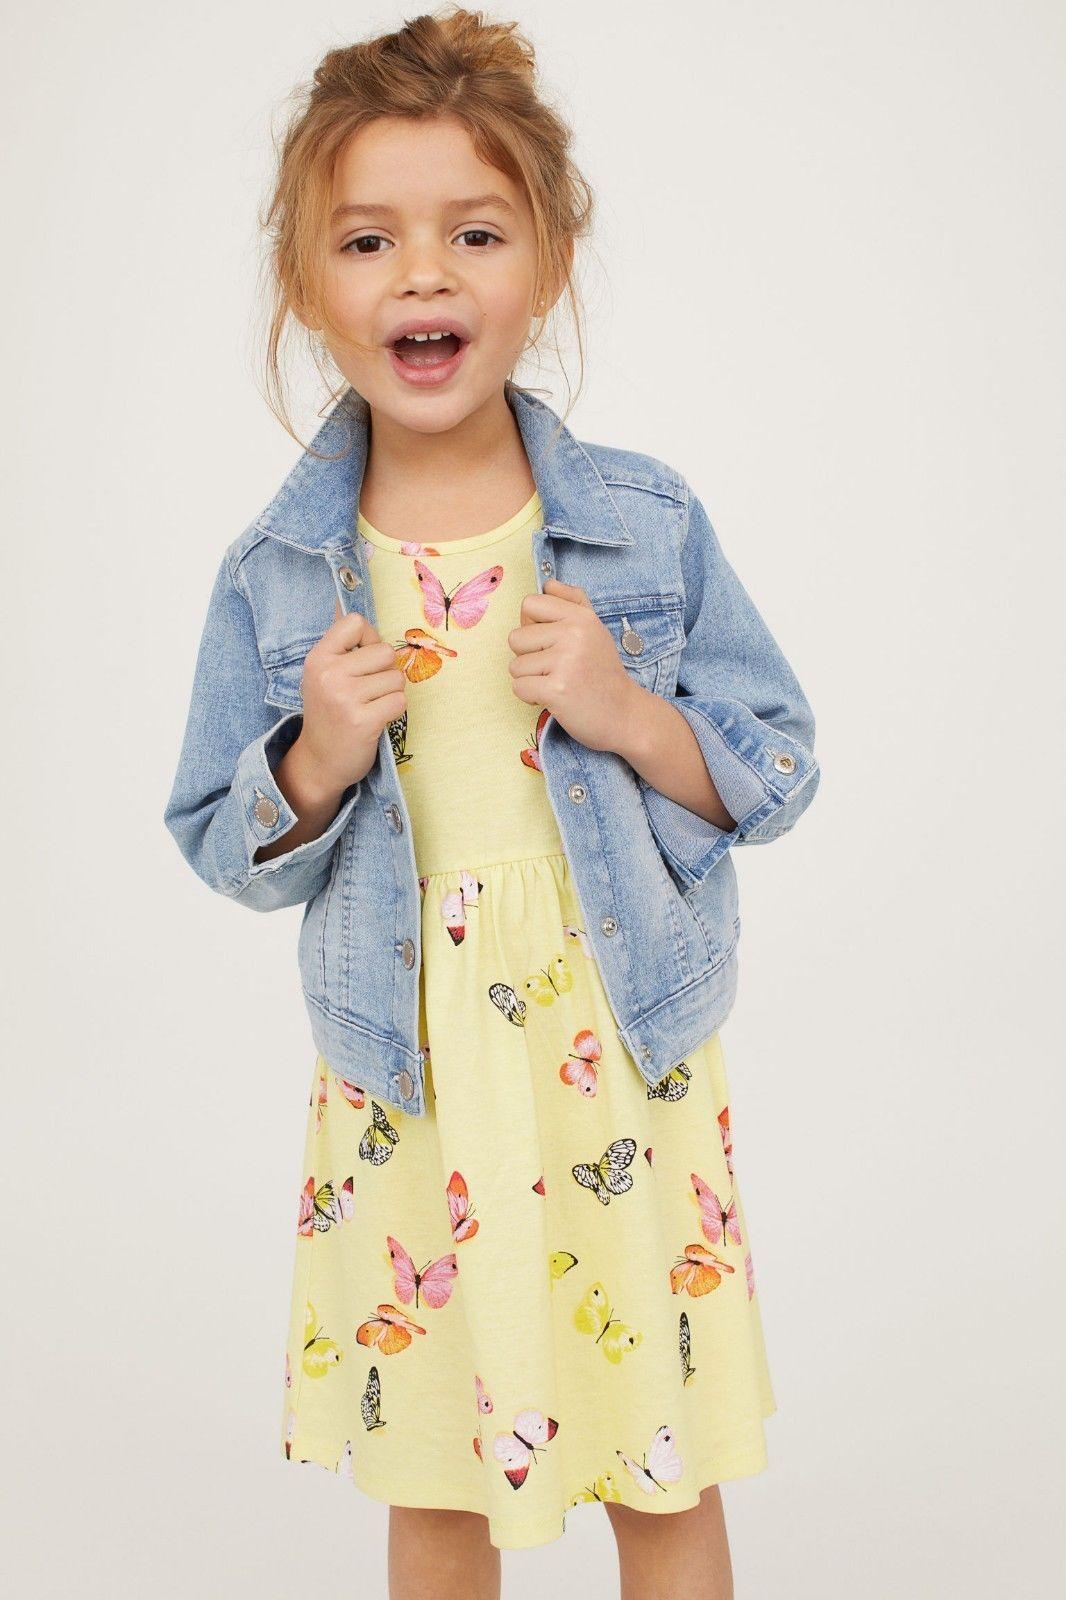 a6e67e5990 H&M Dresses #eBay Clothes, Shoes & Accessories | Beauty & Fashion ...